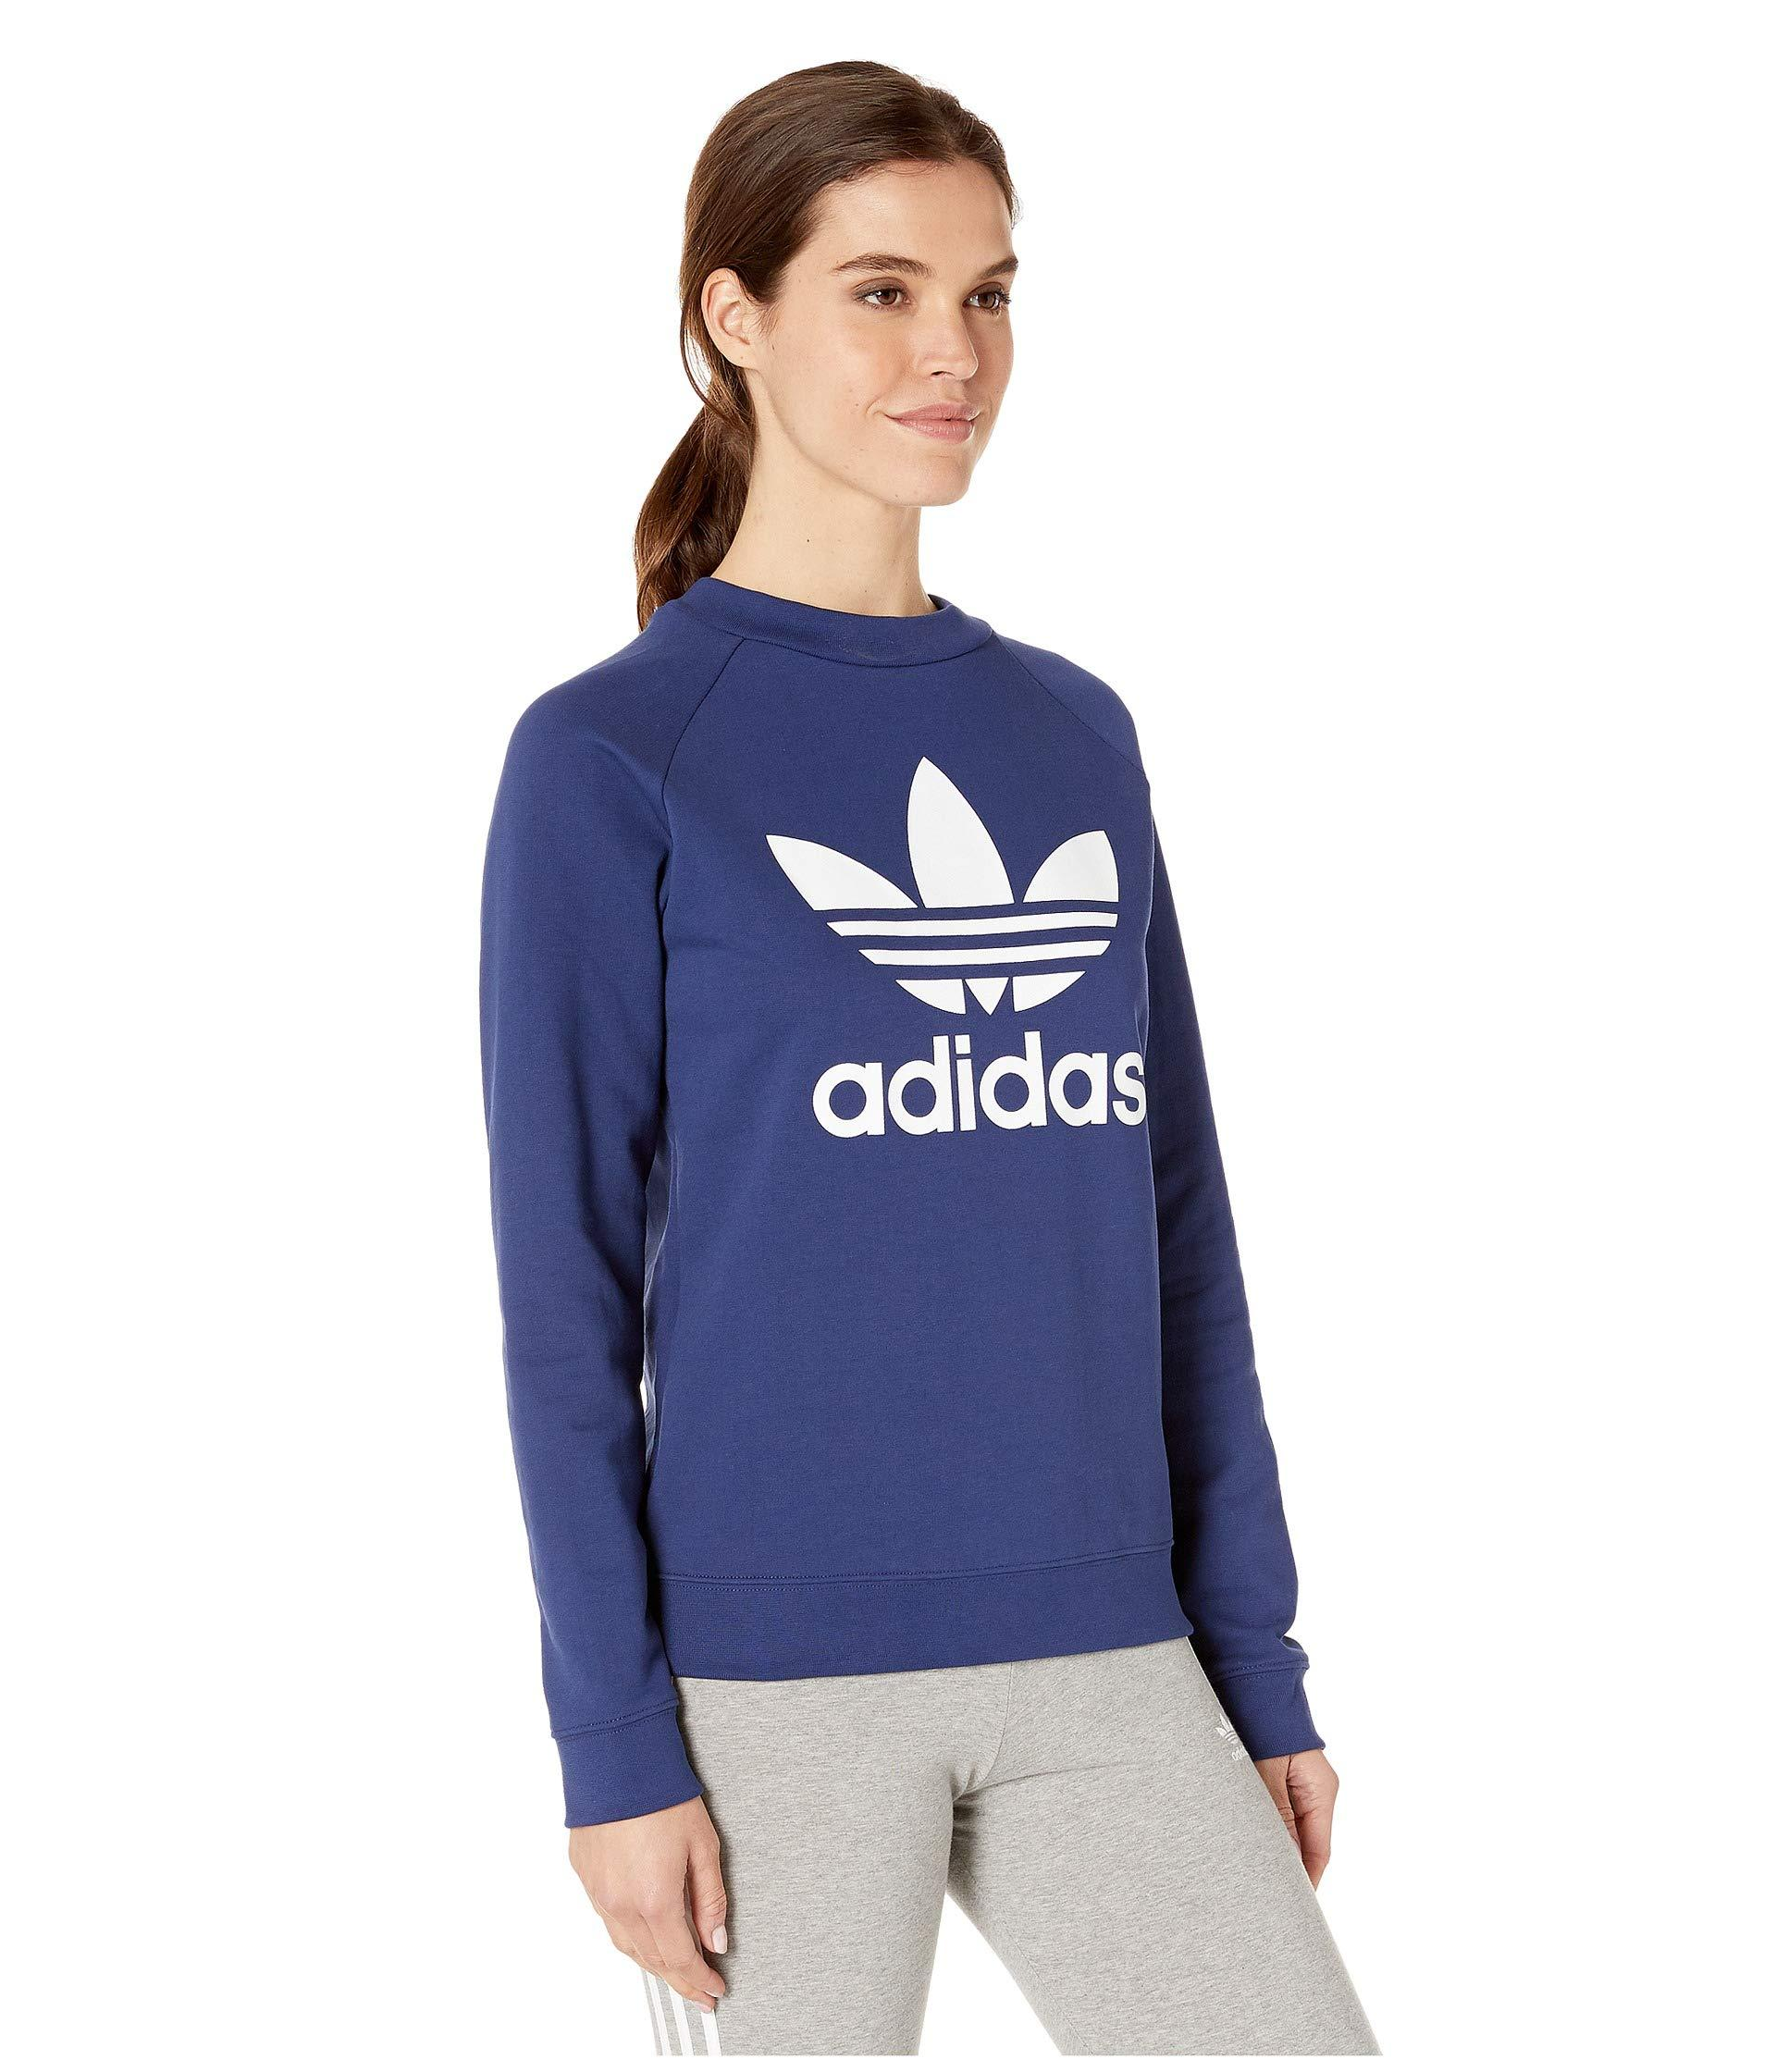 e249304da6c5 Adidas Originals Trefoil Crew Sweatshirt Pink | Saddha